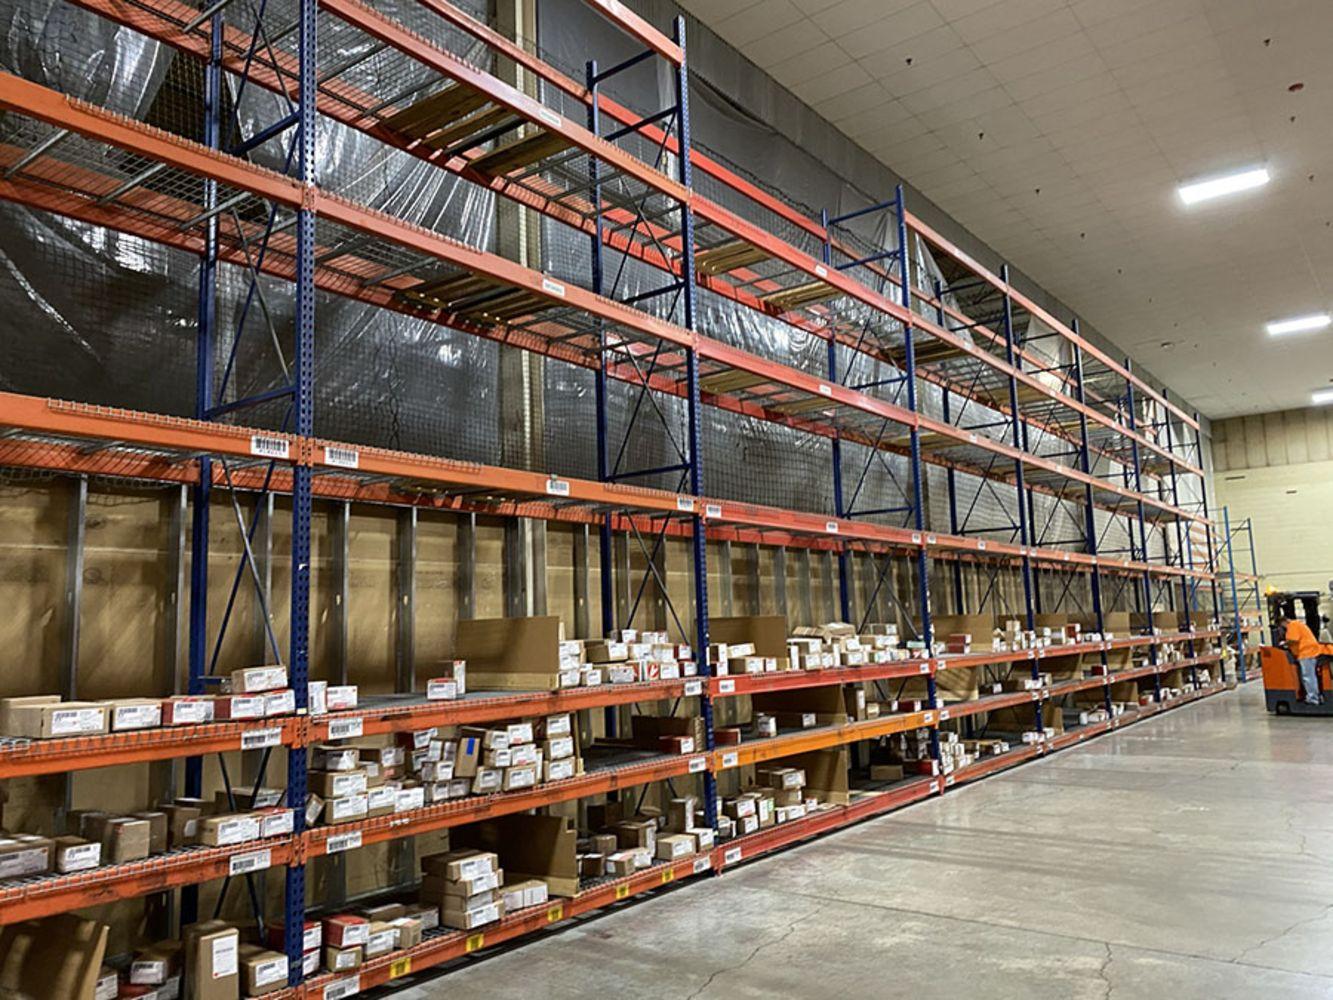 KNOLL, INC. - Distribution Center - Pallet Racking, Forklifts, Turret Trucks, Hoppers